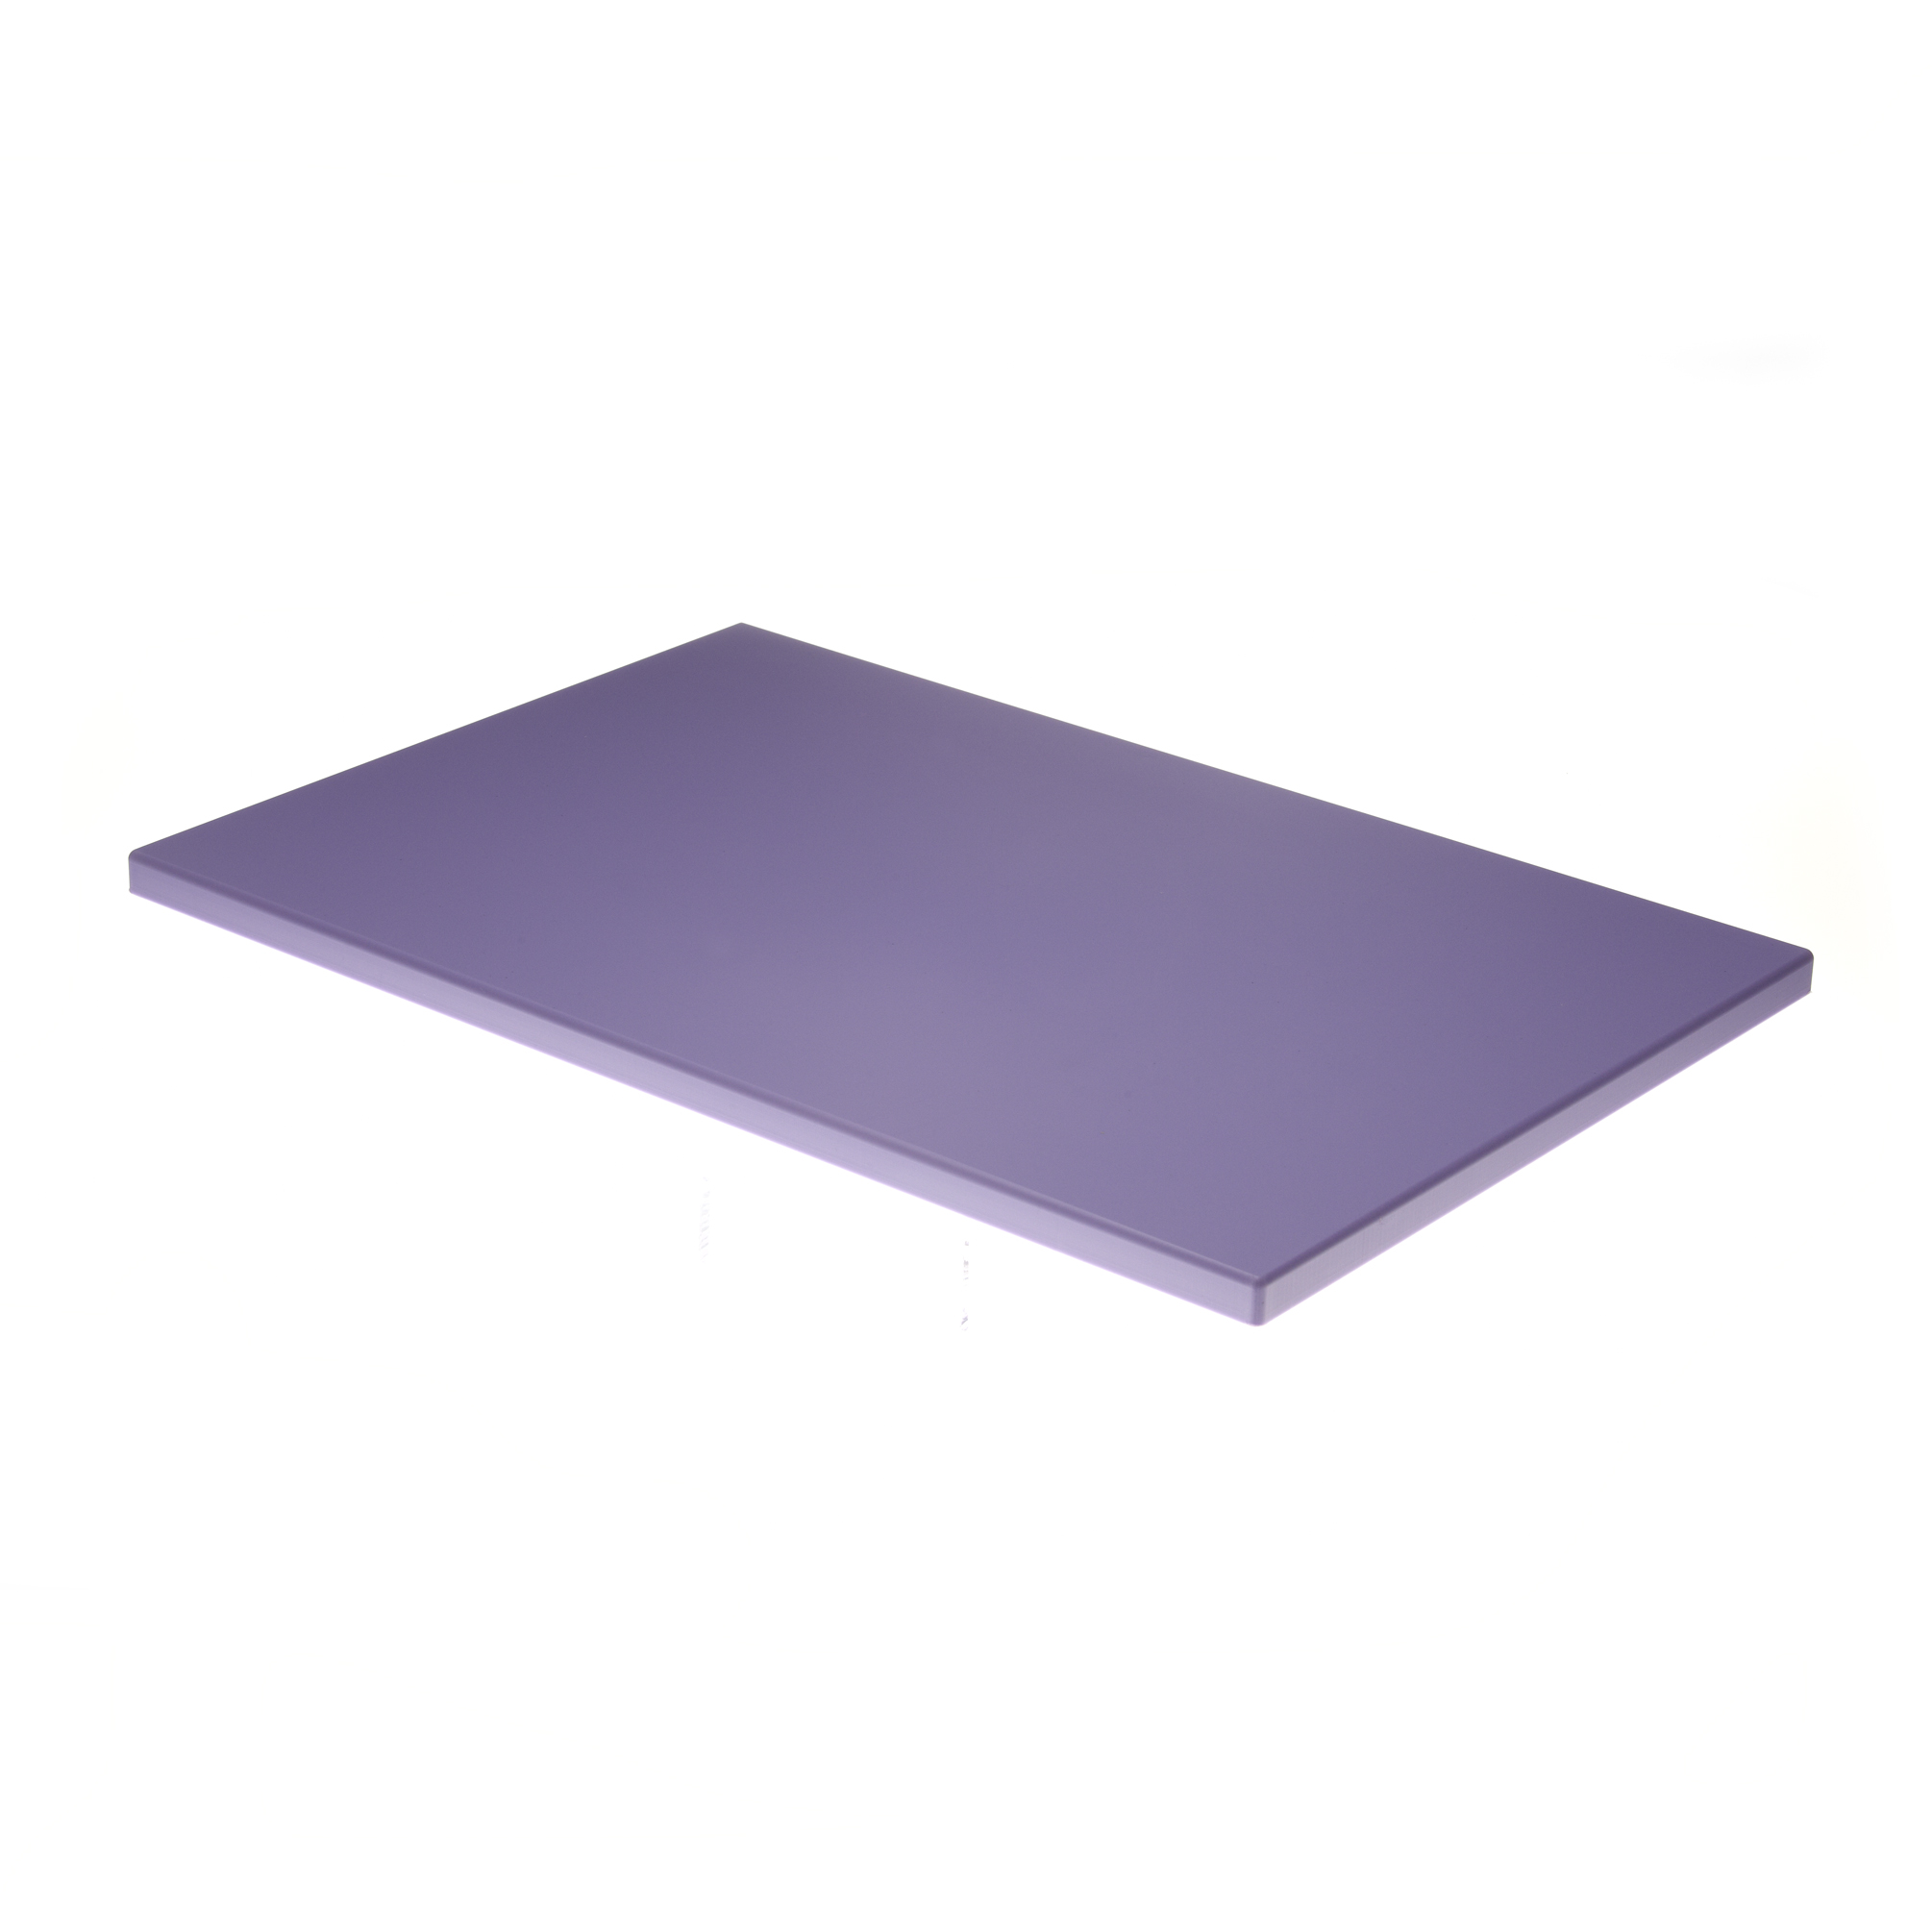 planche d couper en poly thyl ne 600x400x20 mm violet mjpro restauration collective. Black Bedroom Furniture Sets. Home Design Ideas